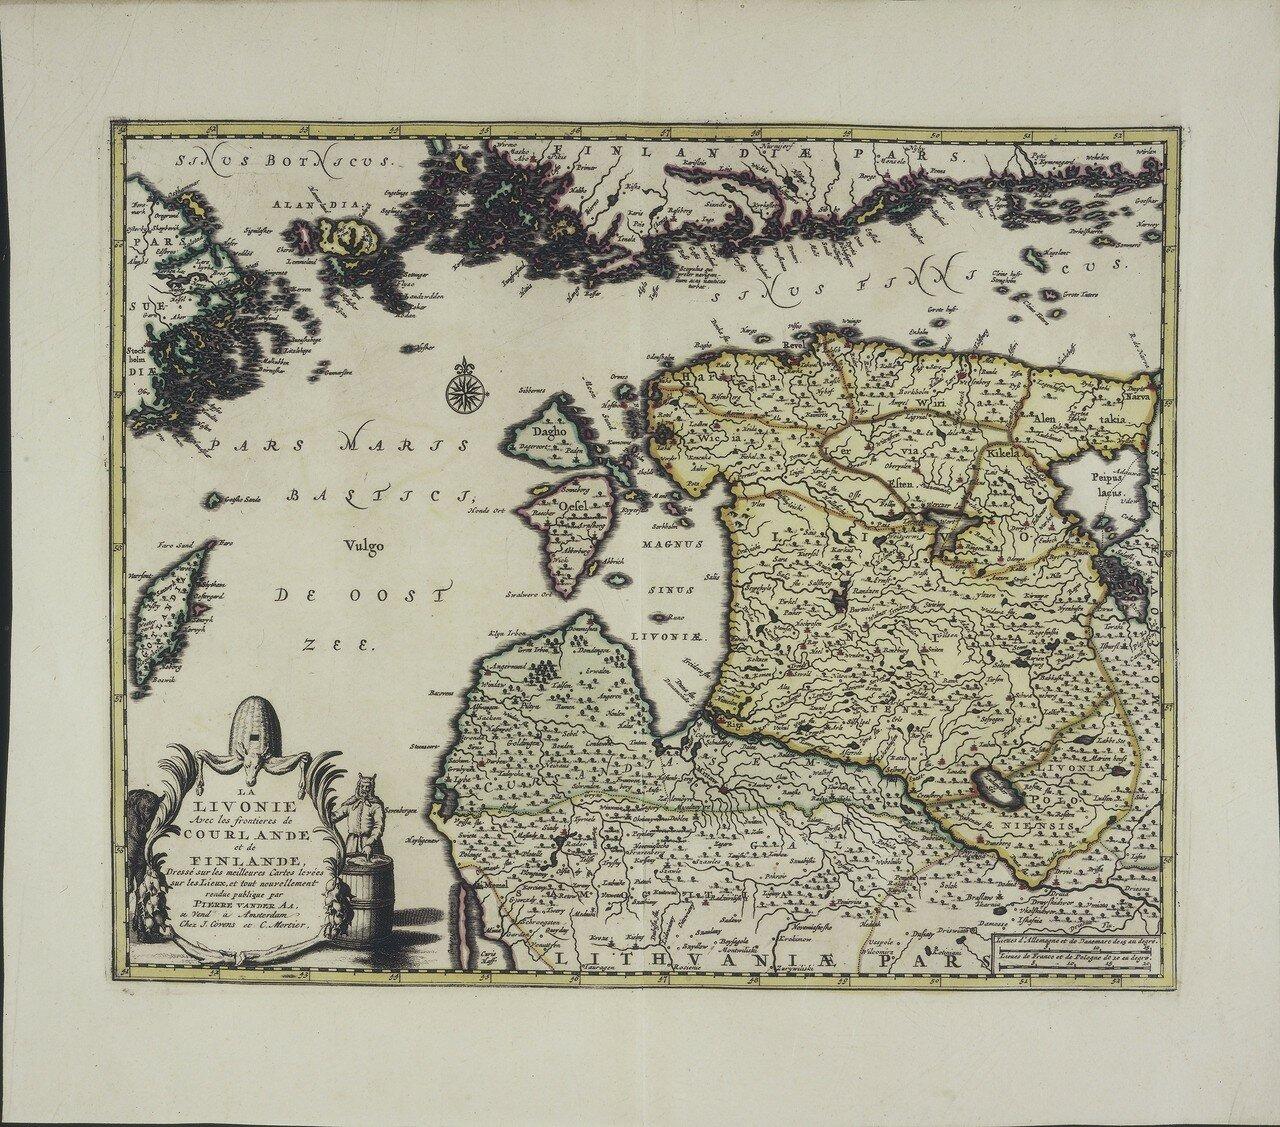 1721. Ливония с ее границами с Финляндией и Курляндией